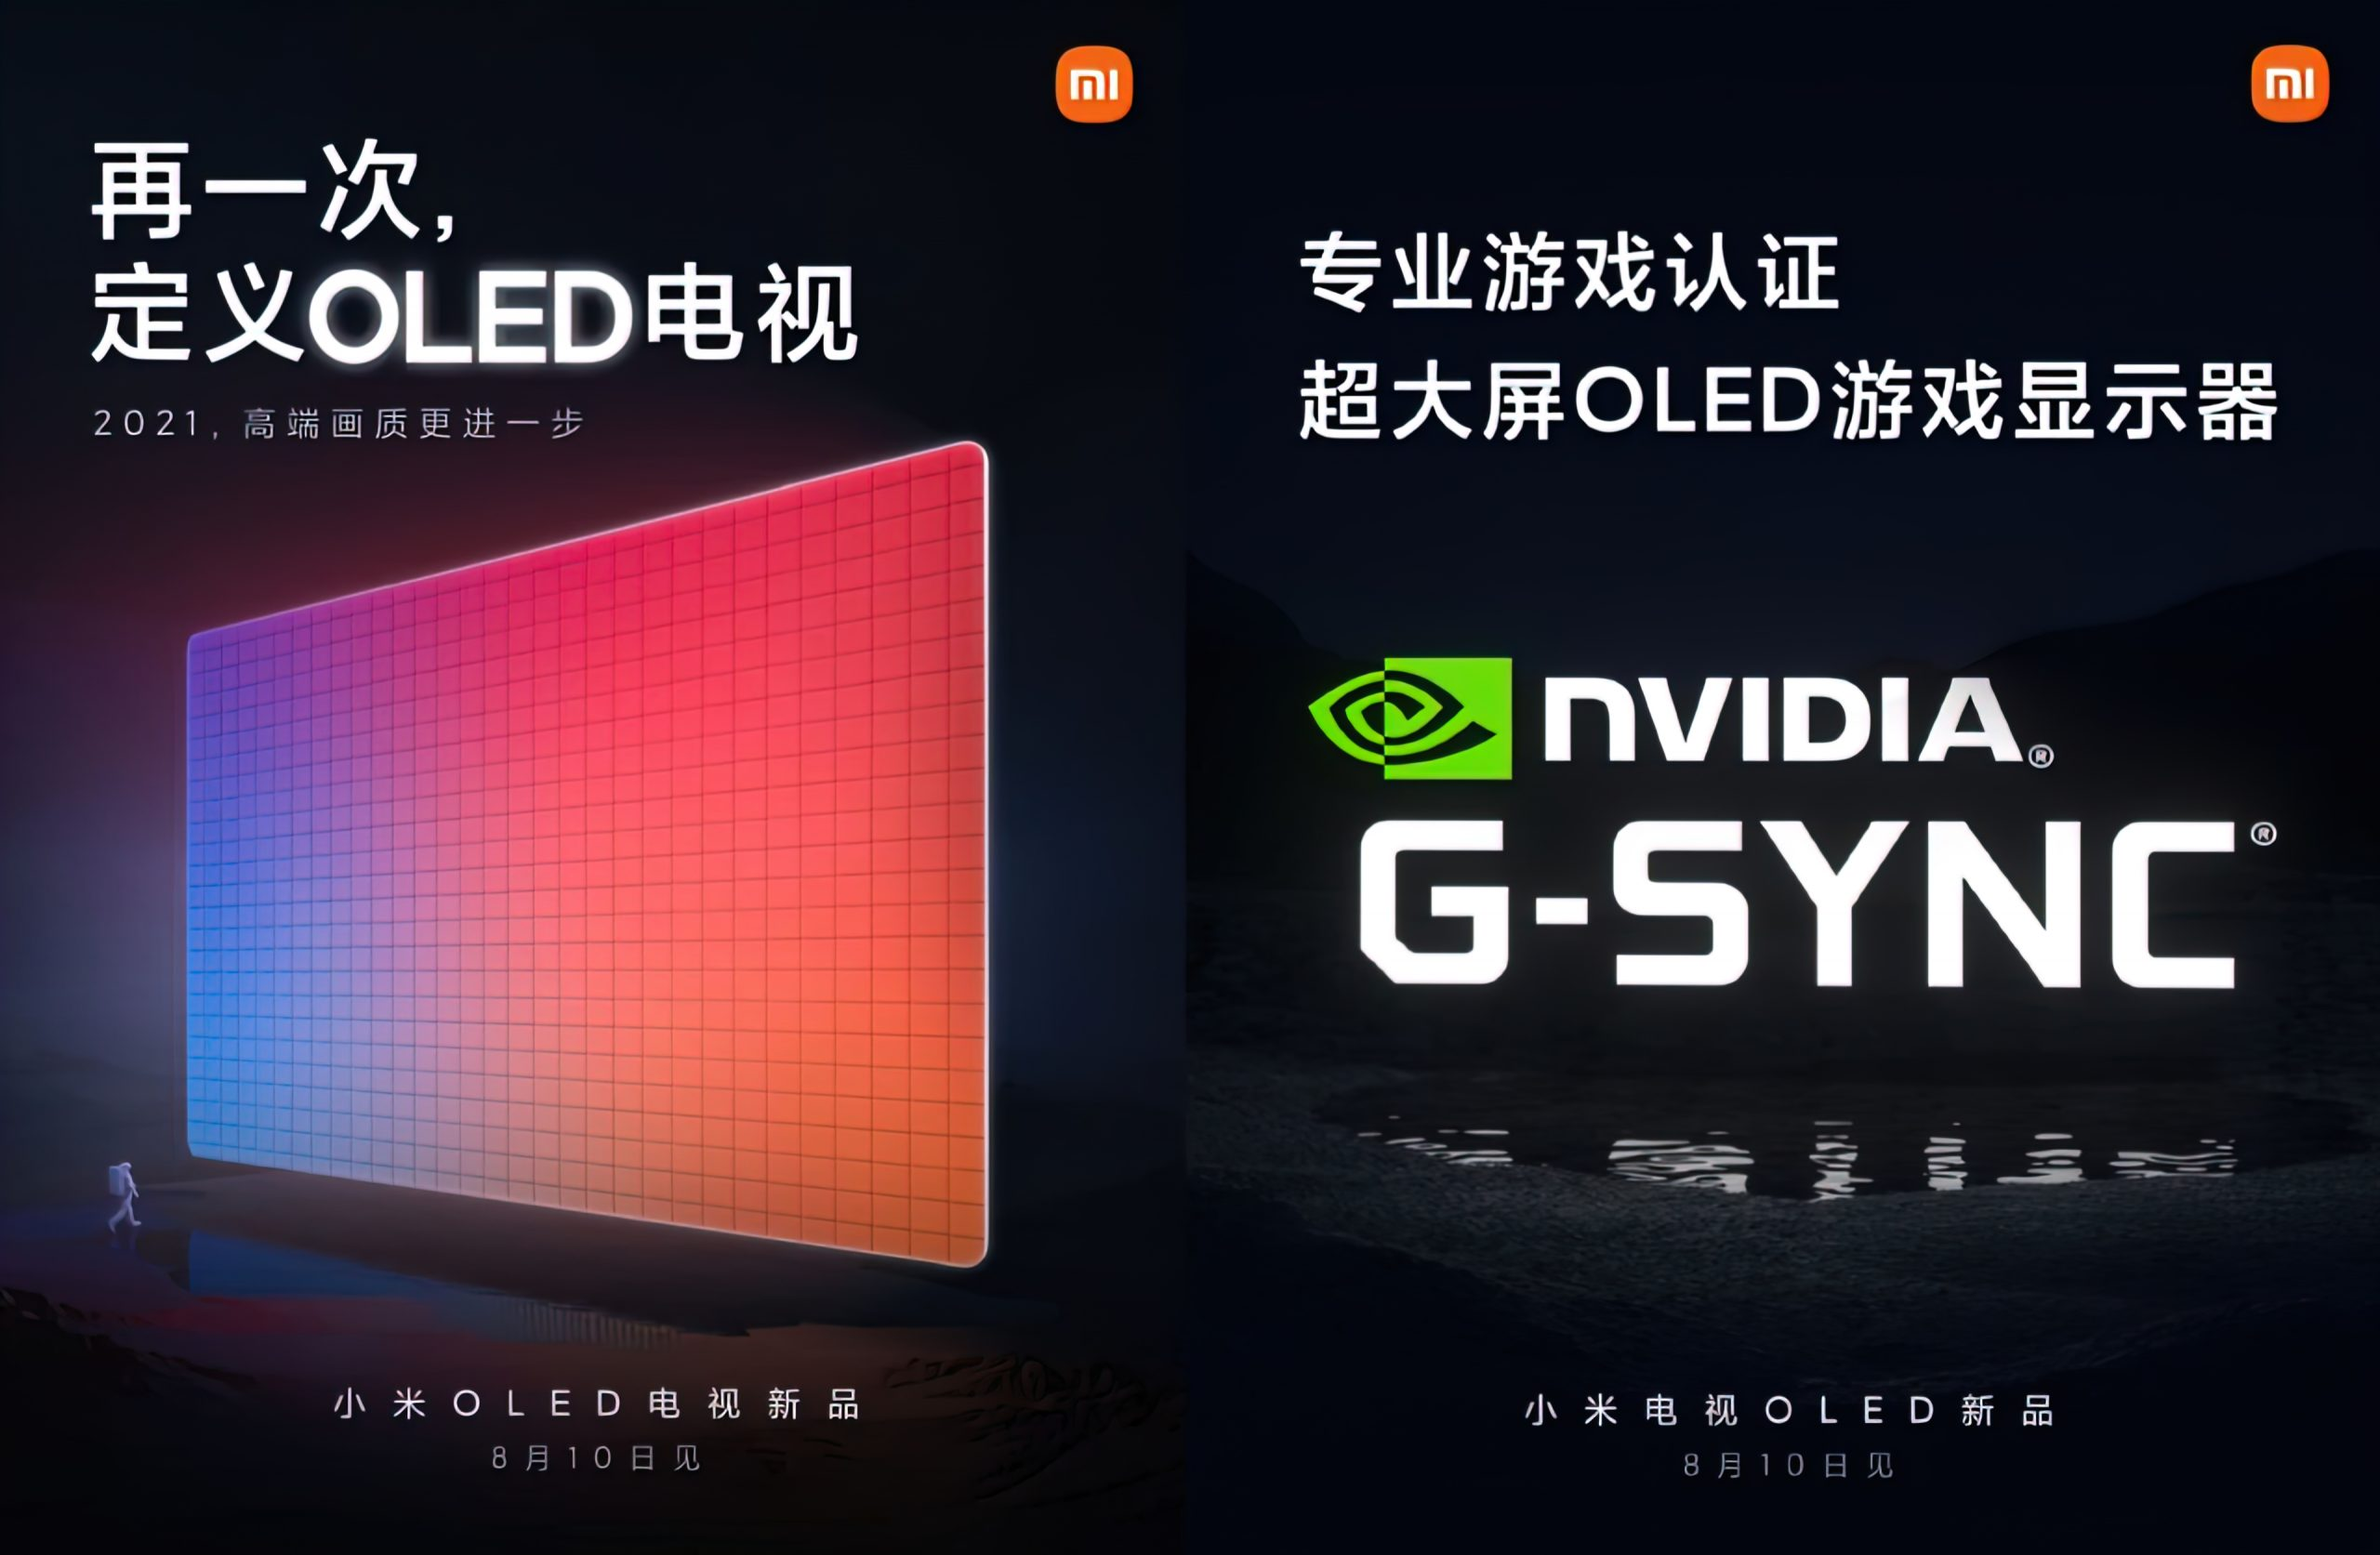 Xiaomi Mi OLED TV 2021 NVIDIA GSYNC